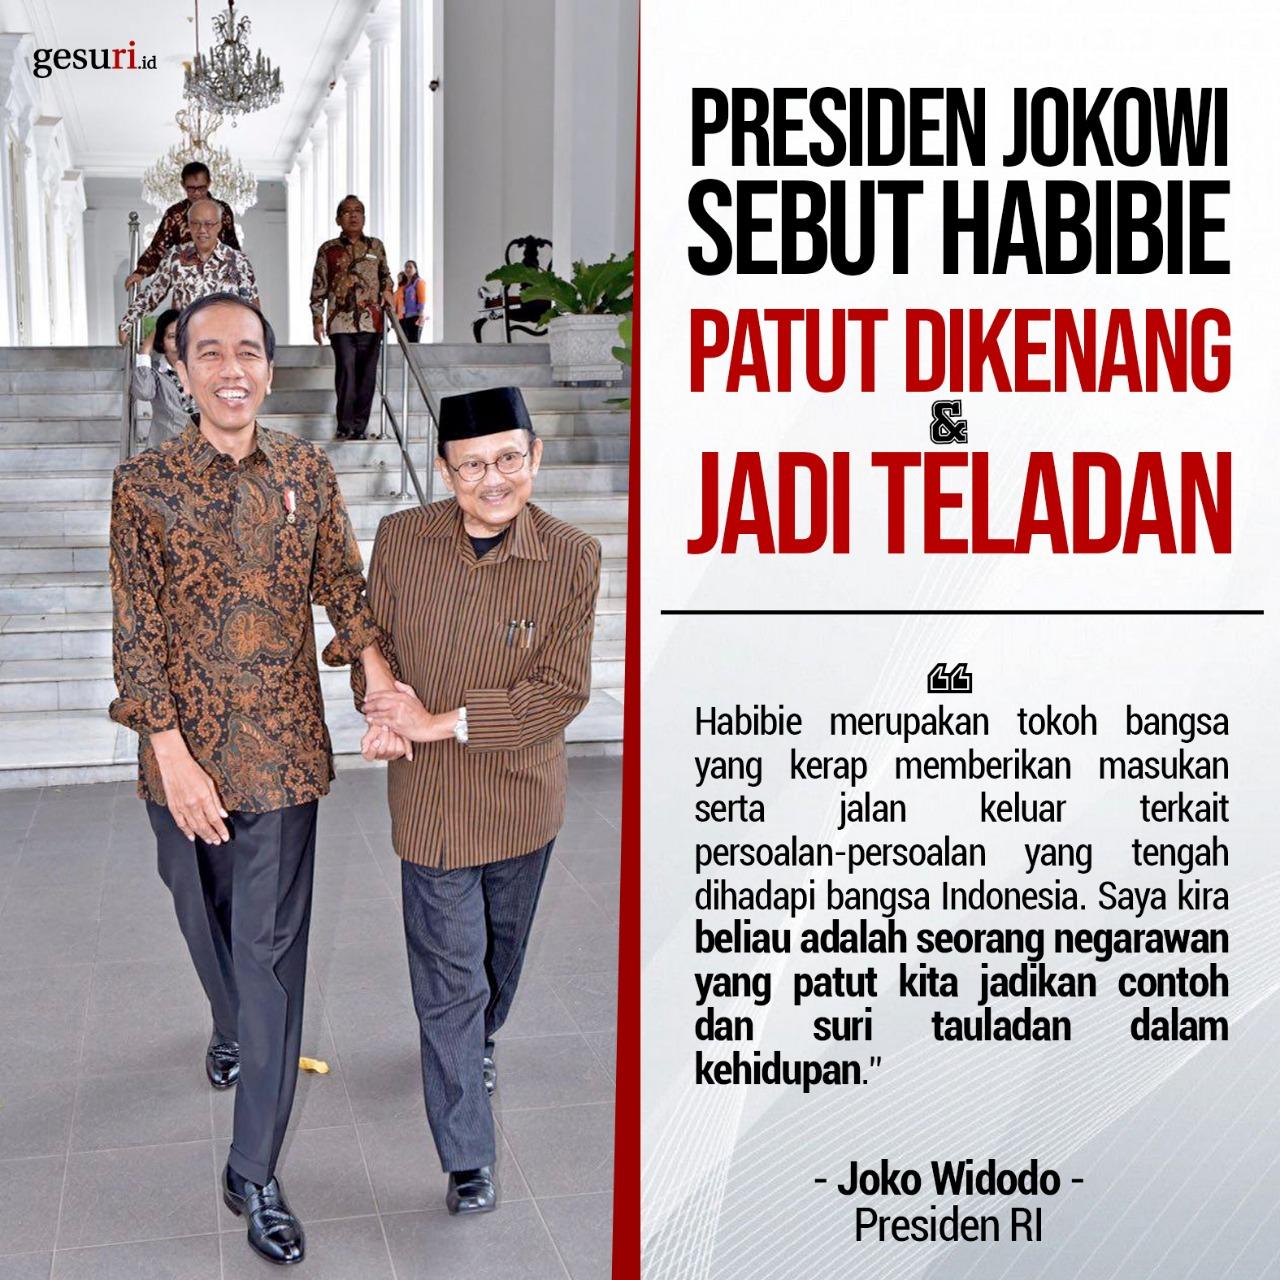 Presiden Jokowi Sebut Habibie Patut Dikenang & Jadi Teladan